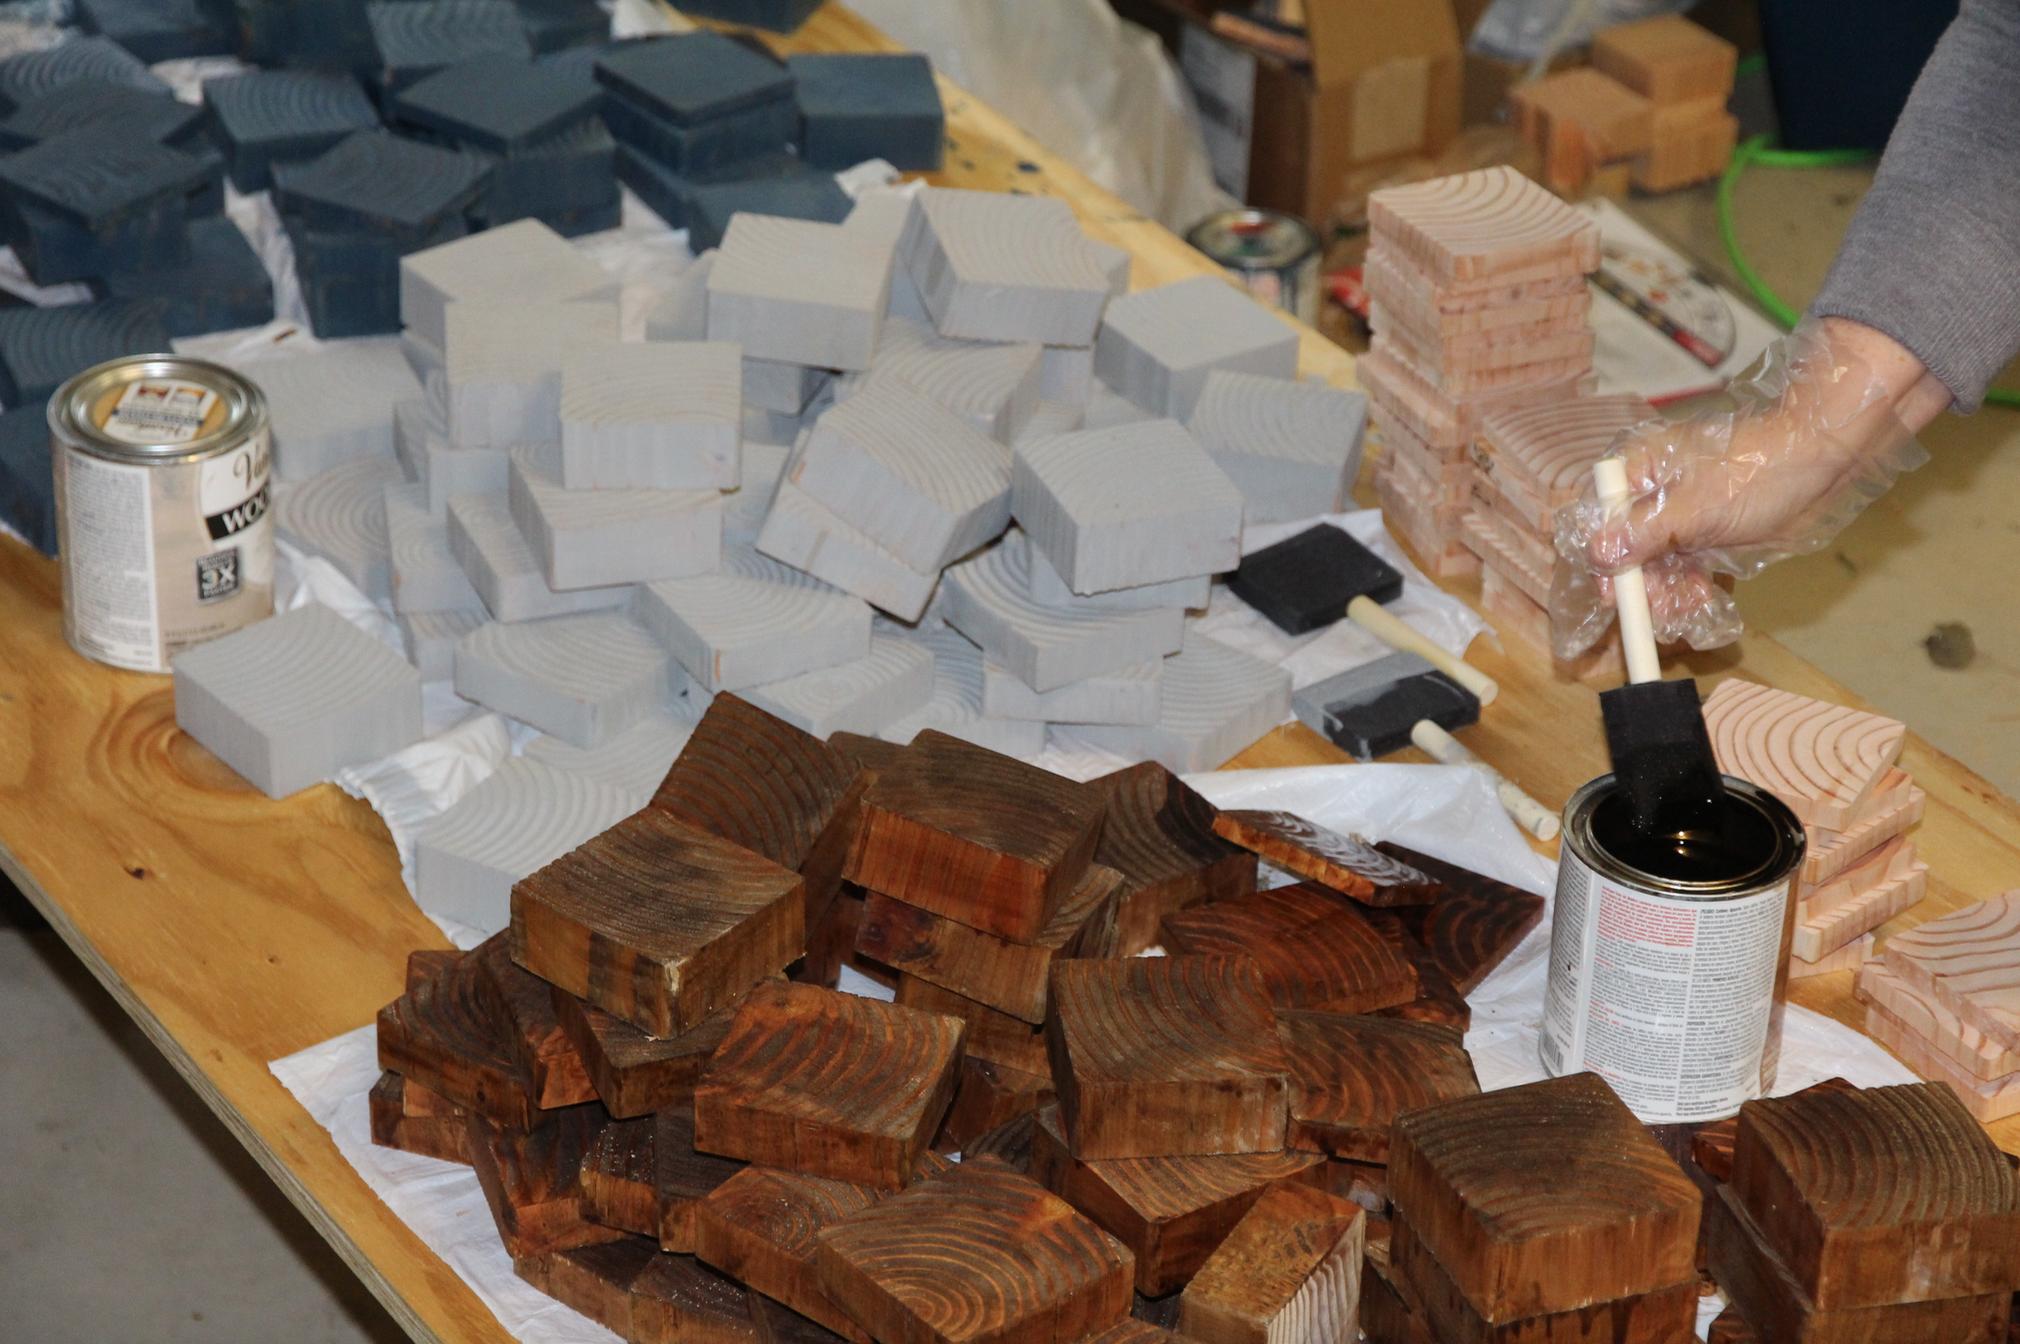 Staining Blocks